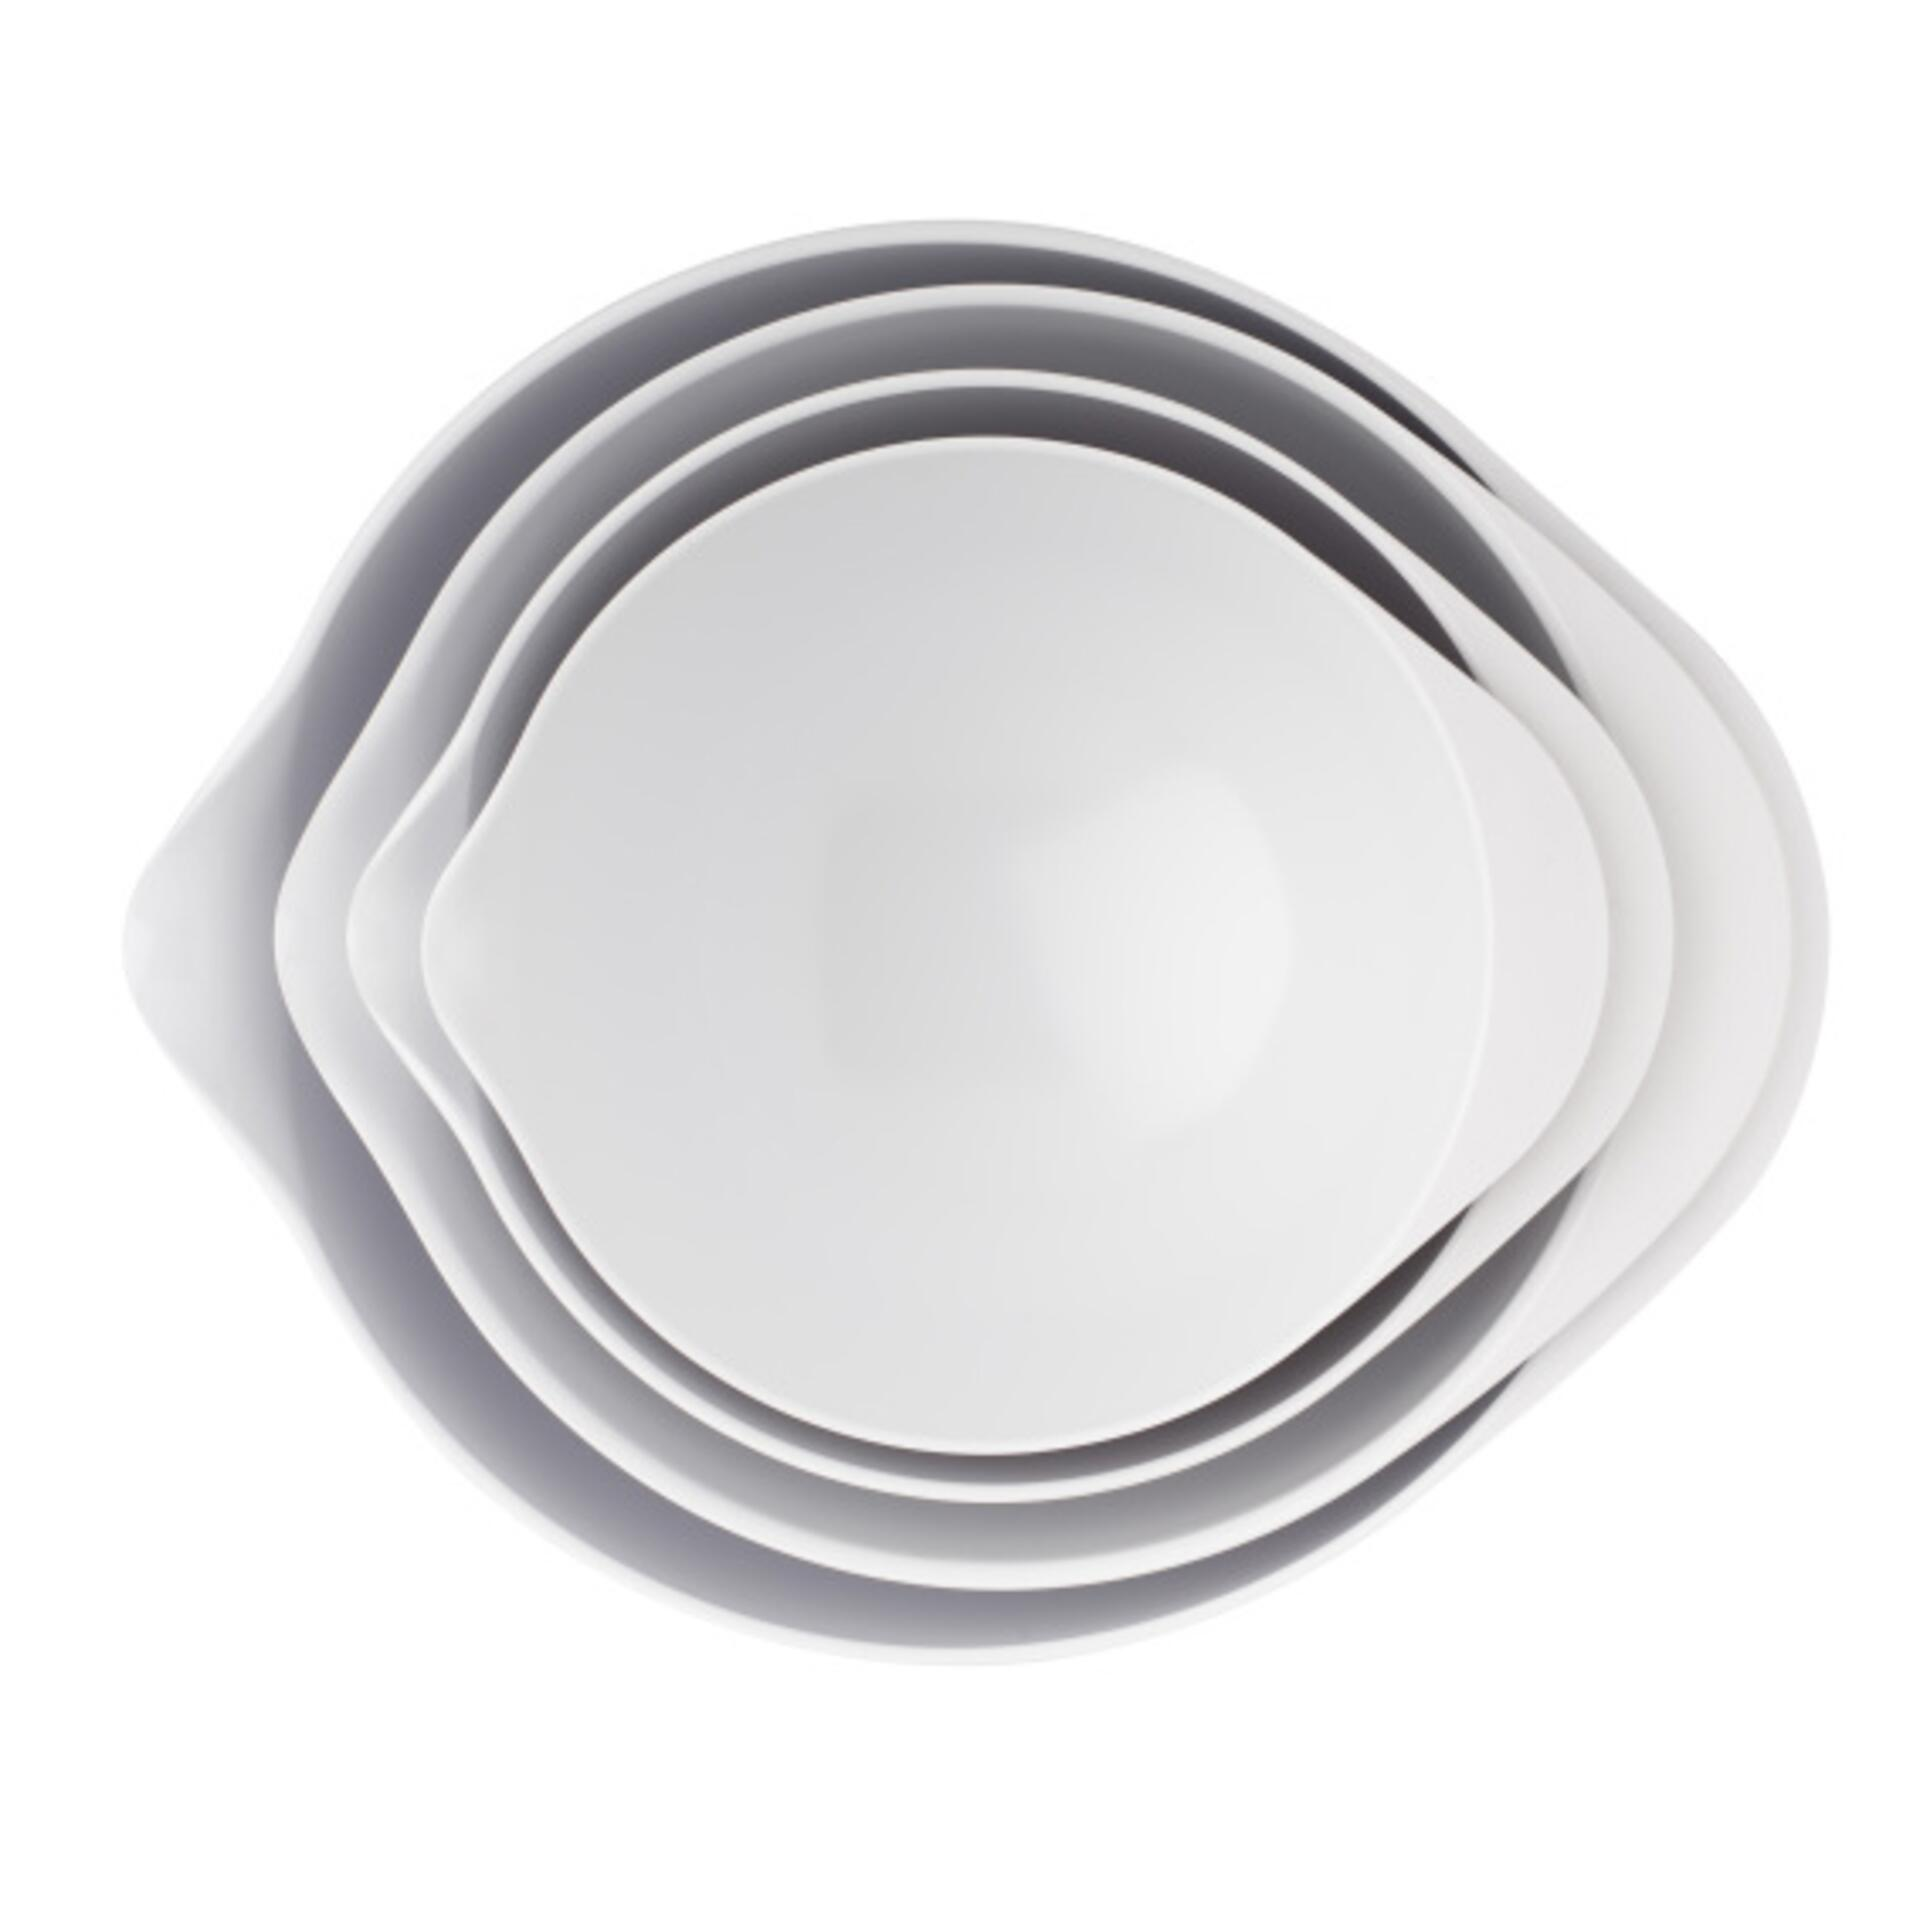 Rosti Mepal Margrethe Rührschüssel 5,0 l Grau